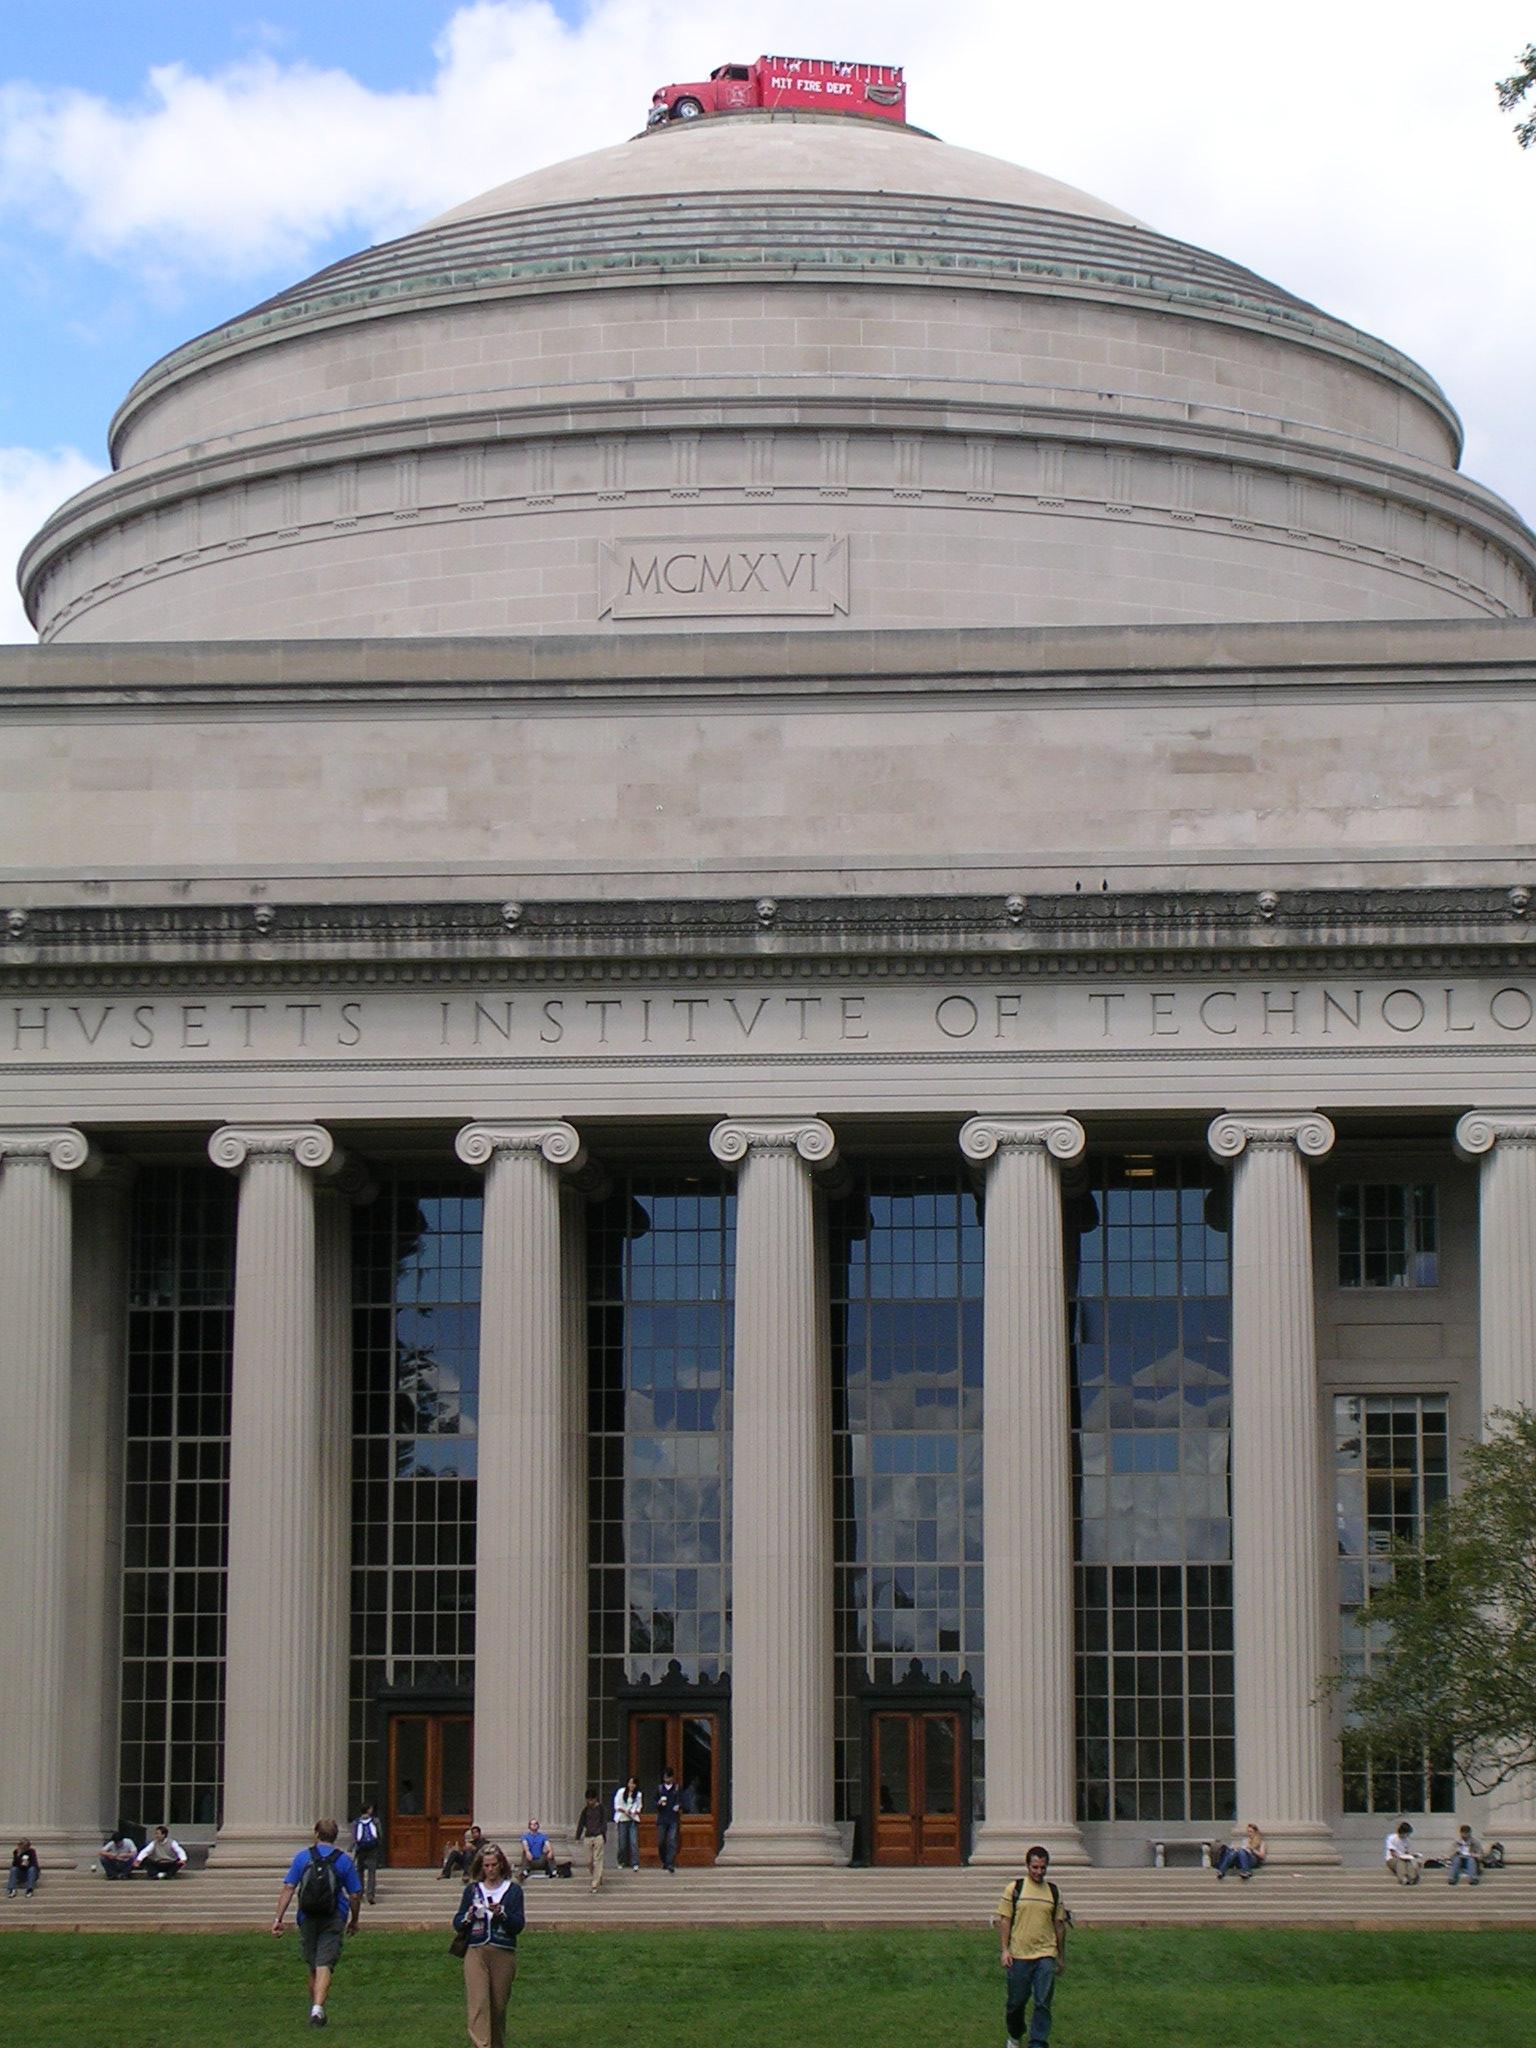 Hacks at the Massachusetts Institute of Technology - Wikipedia